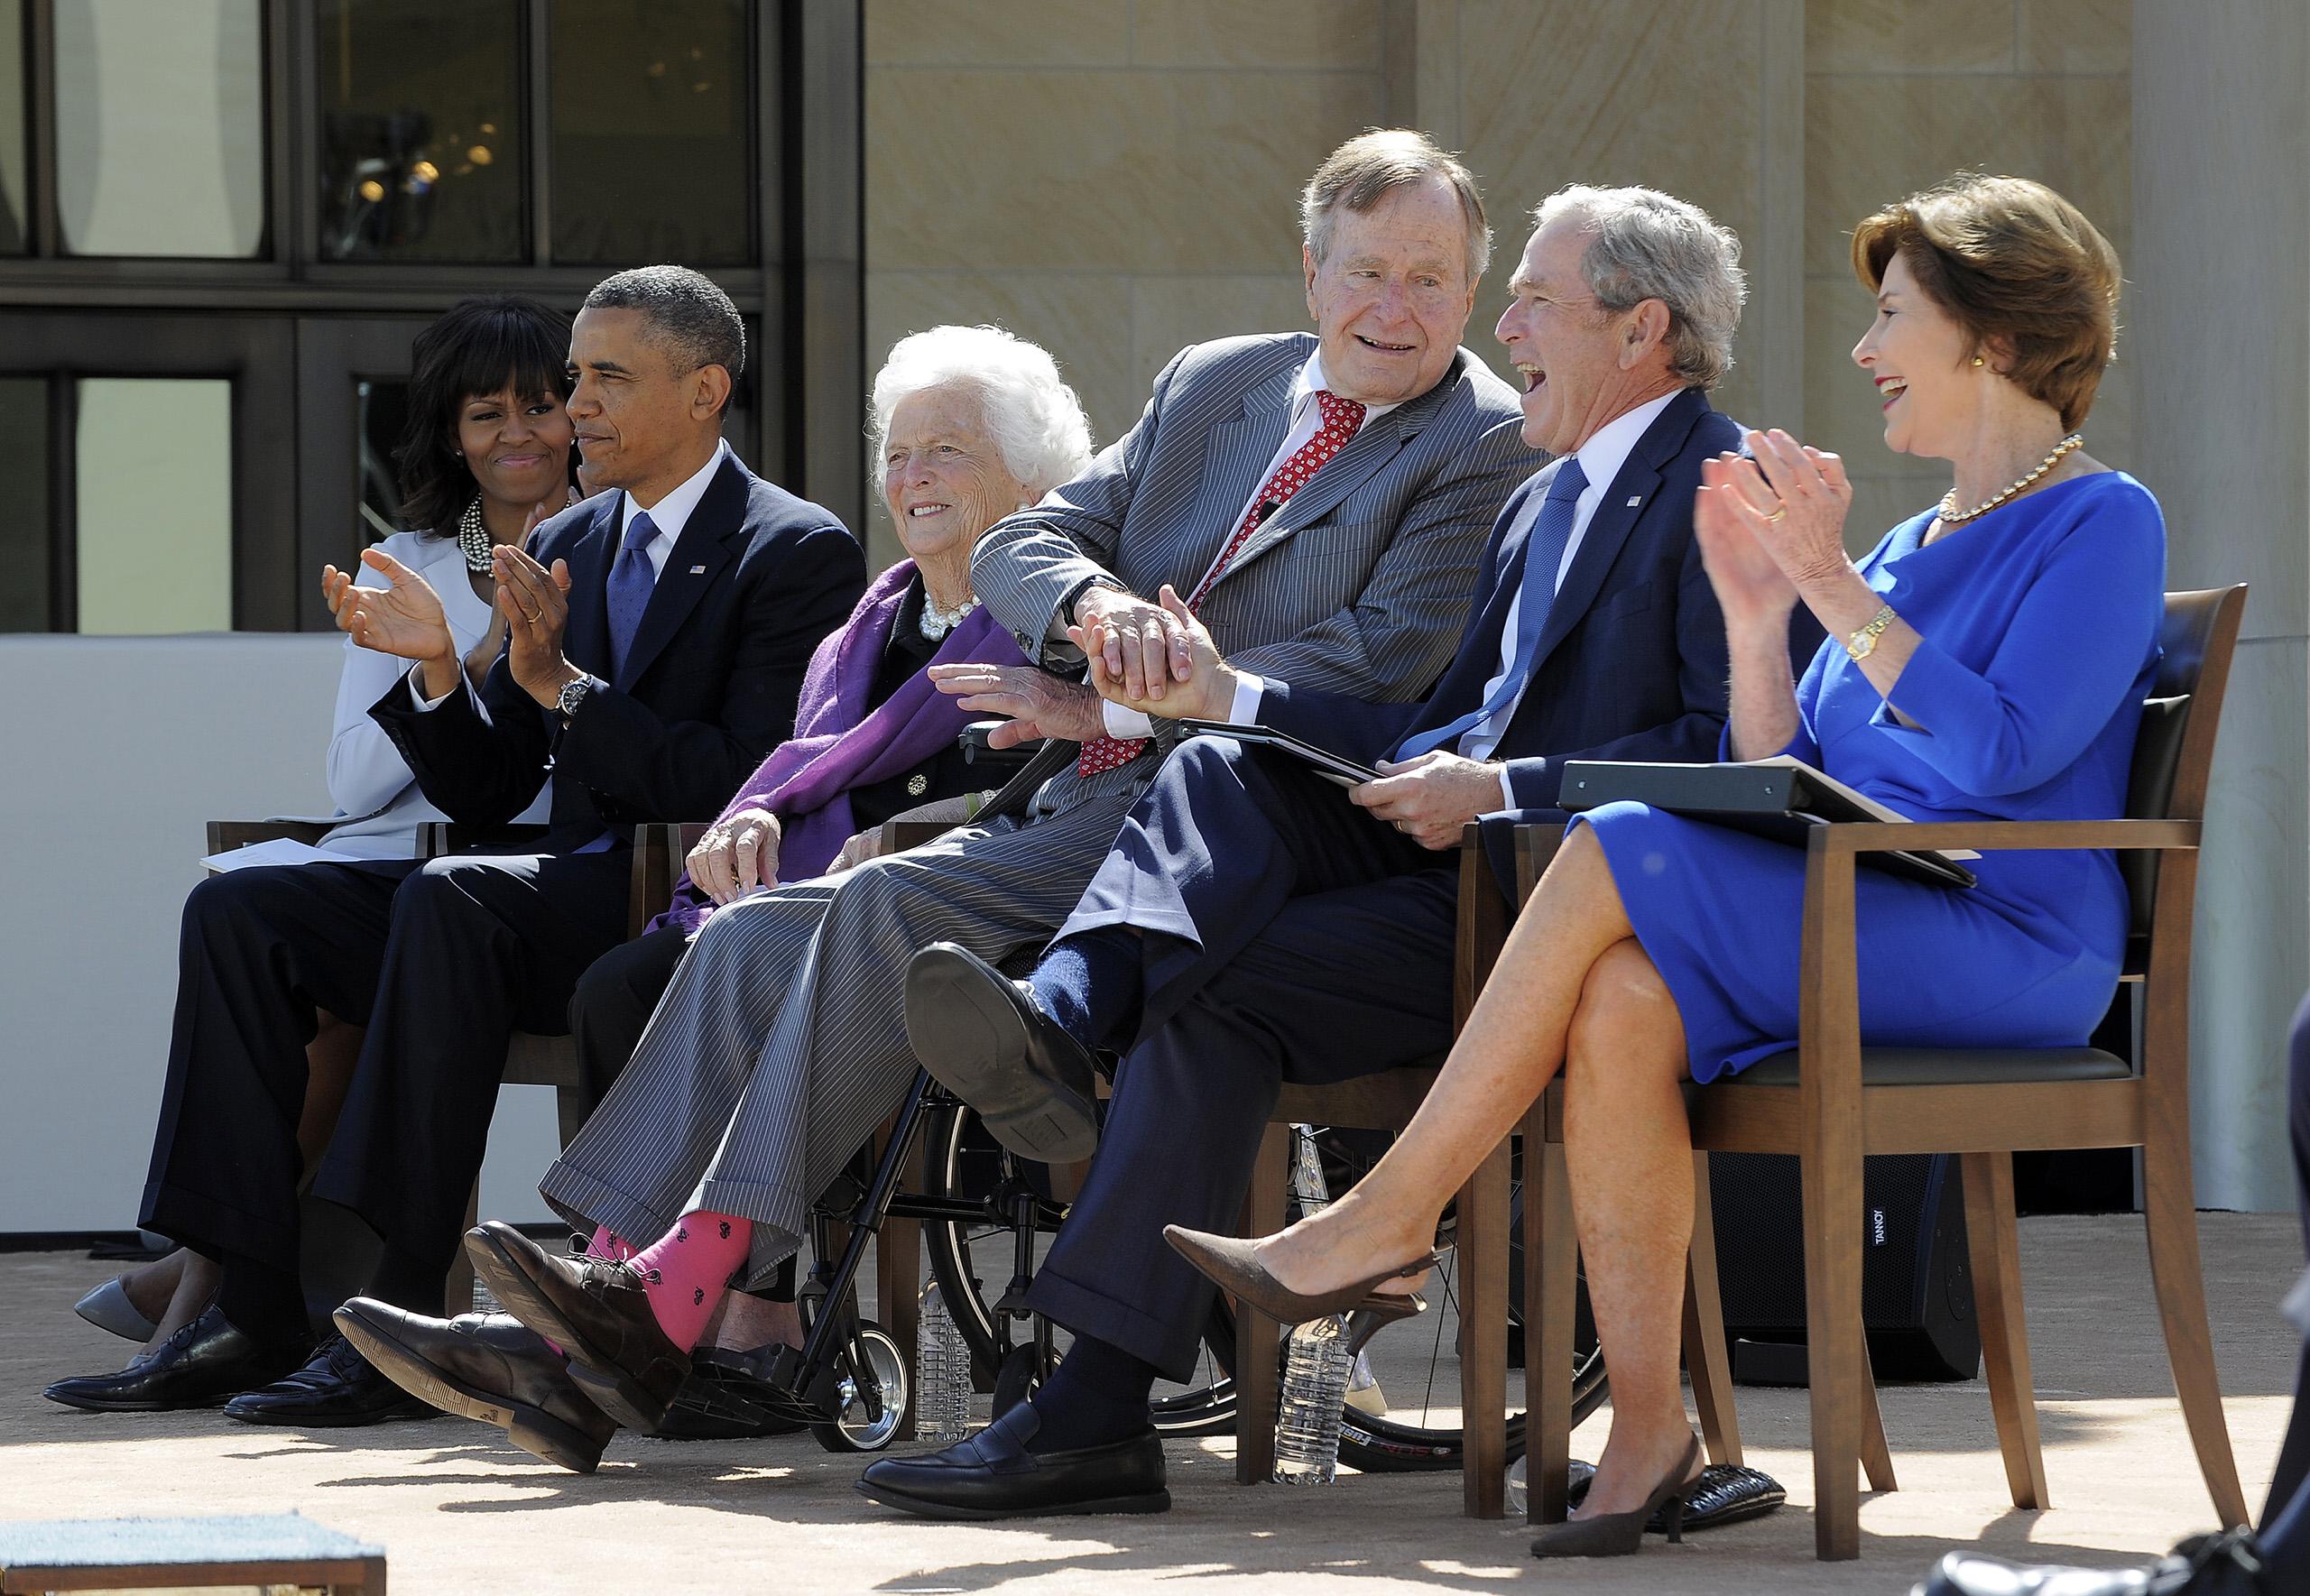 Michelle Obama, Barack Obama former First Lady Barbara Bush, former US President George W. Bush and former US First Lady Laura Bush listen as former President George H.W. Bush speaks during the George W. Bush Presidential Center dedication ceremony in Dallas, Texas, on April 25, 2013.